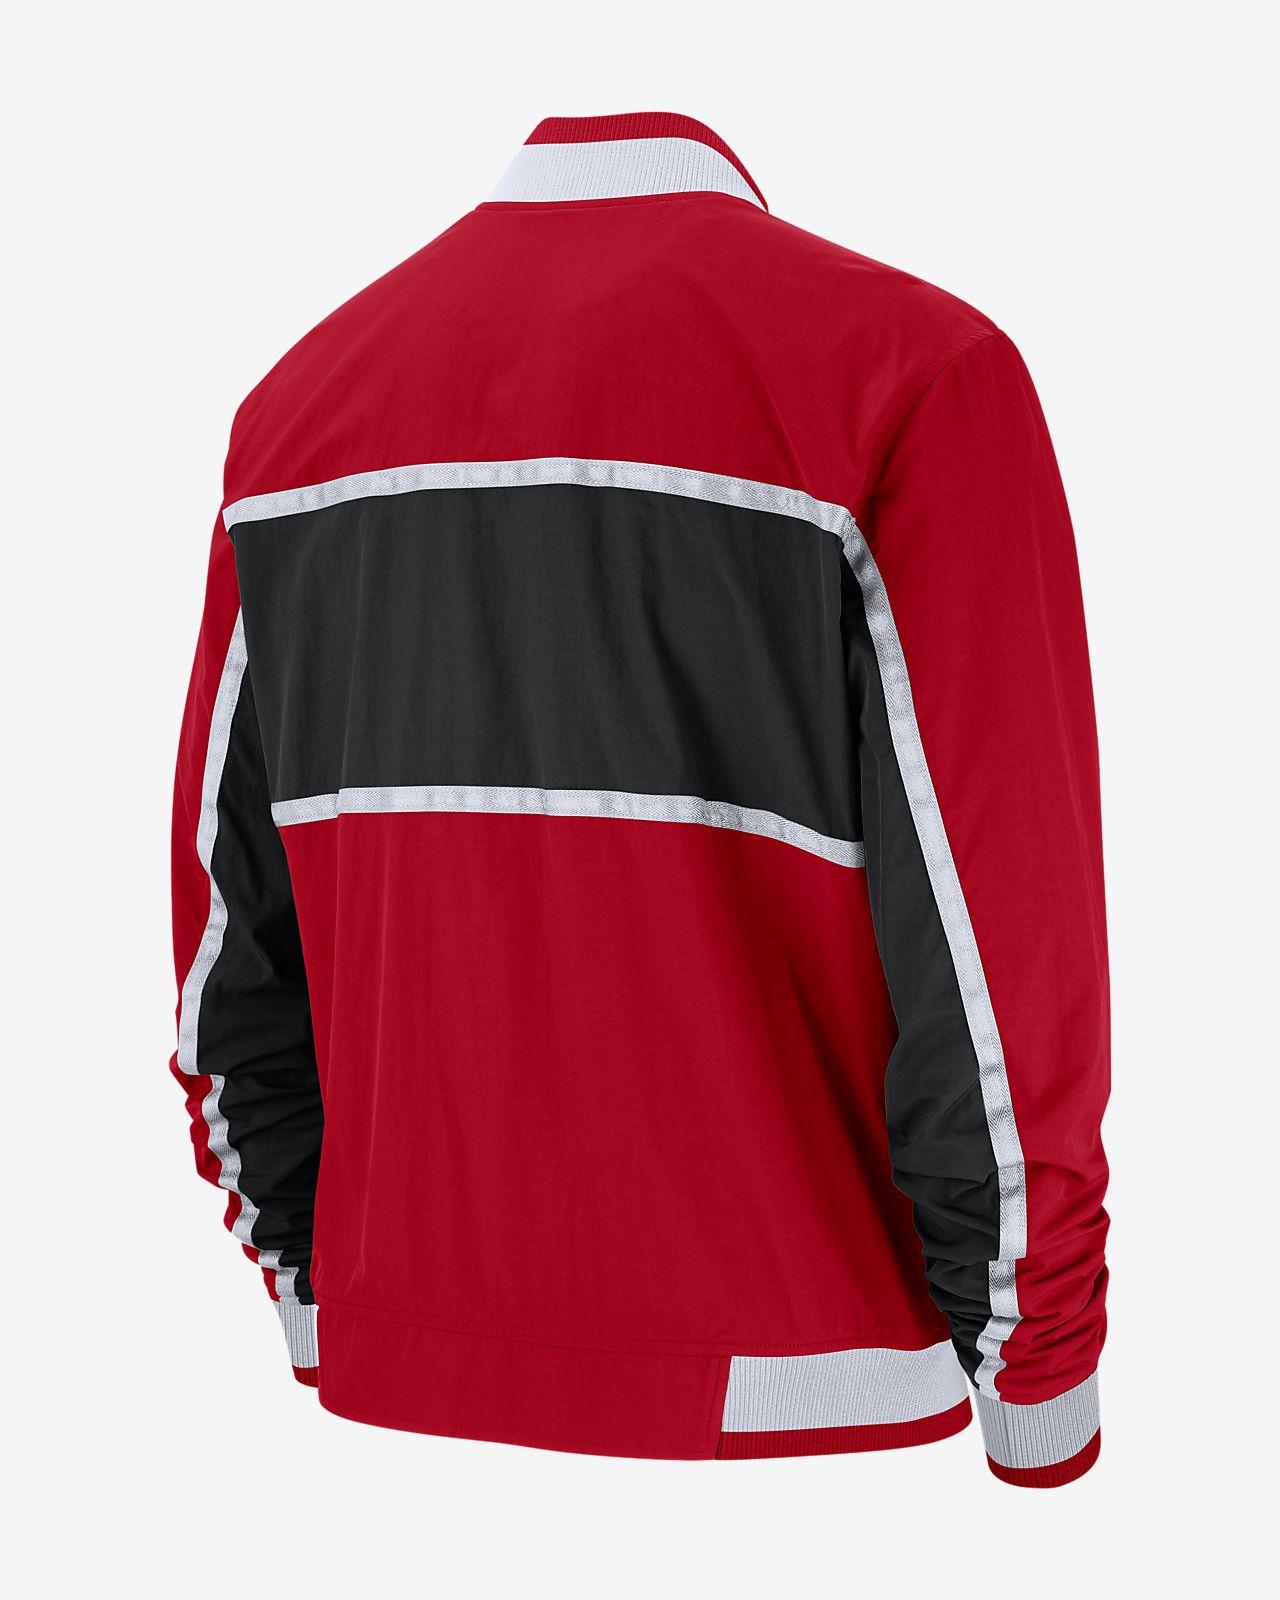 ec94290b07e Chicago Bulls Nike Courtside Men s NBA Jacket. Nike.com